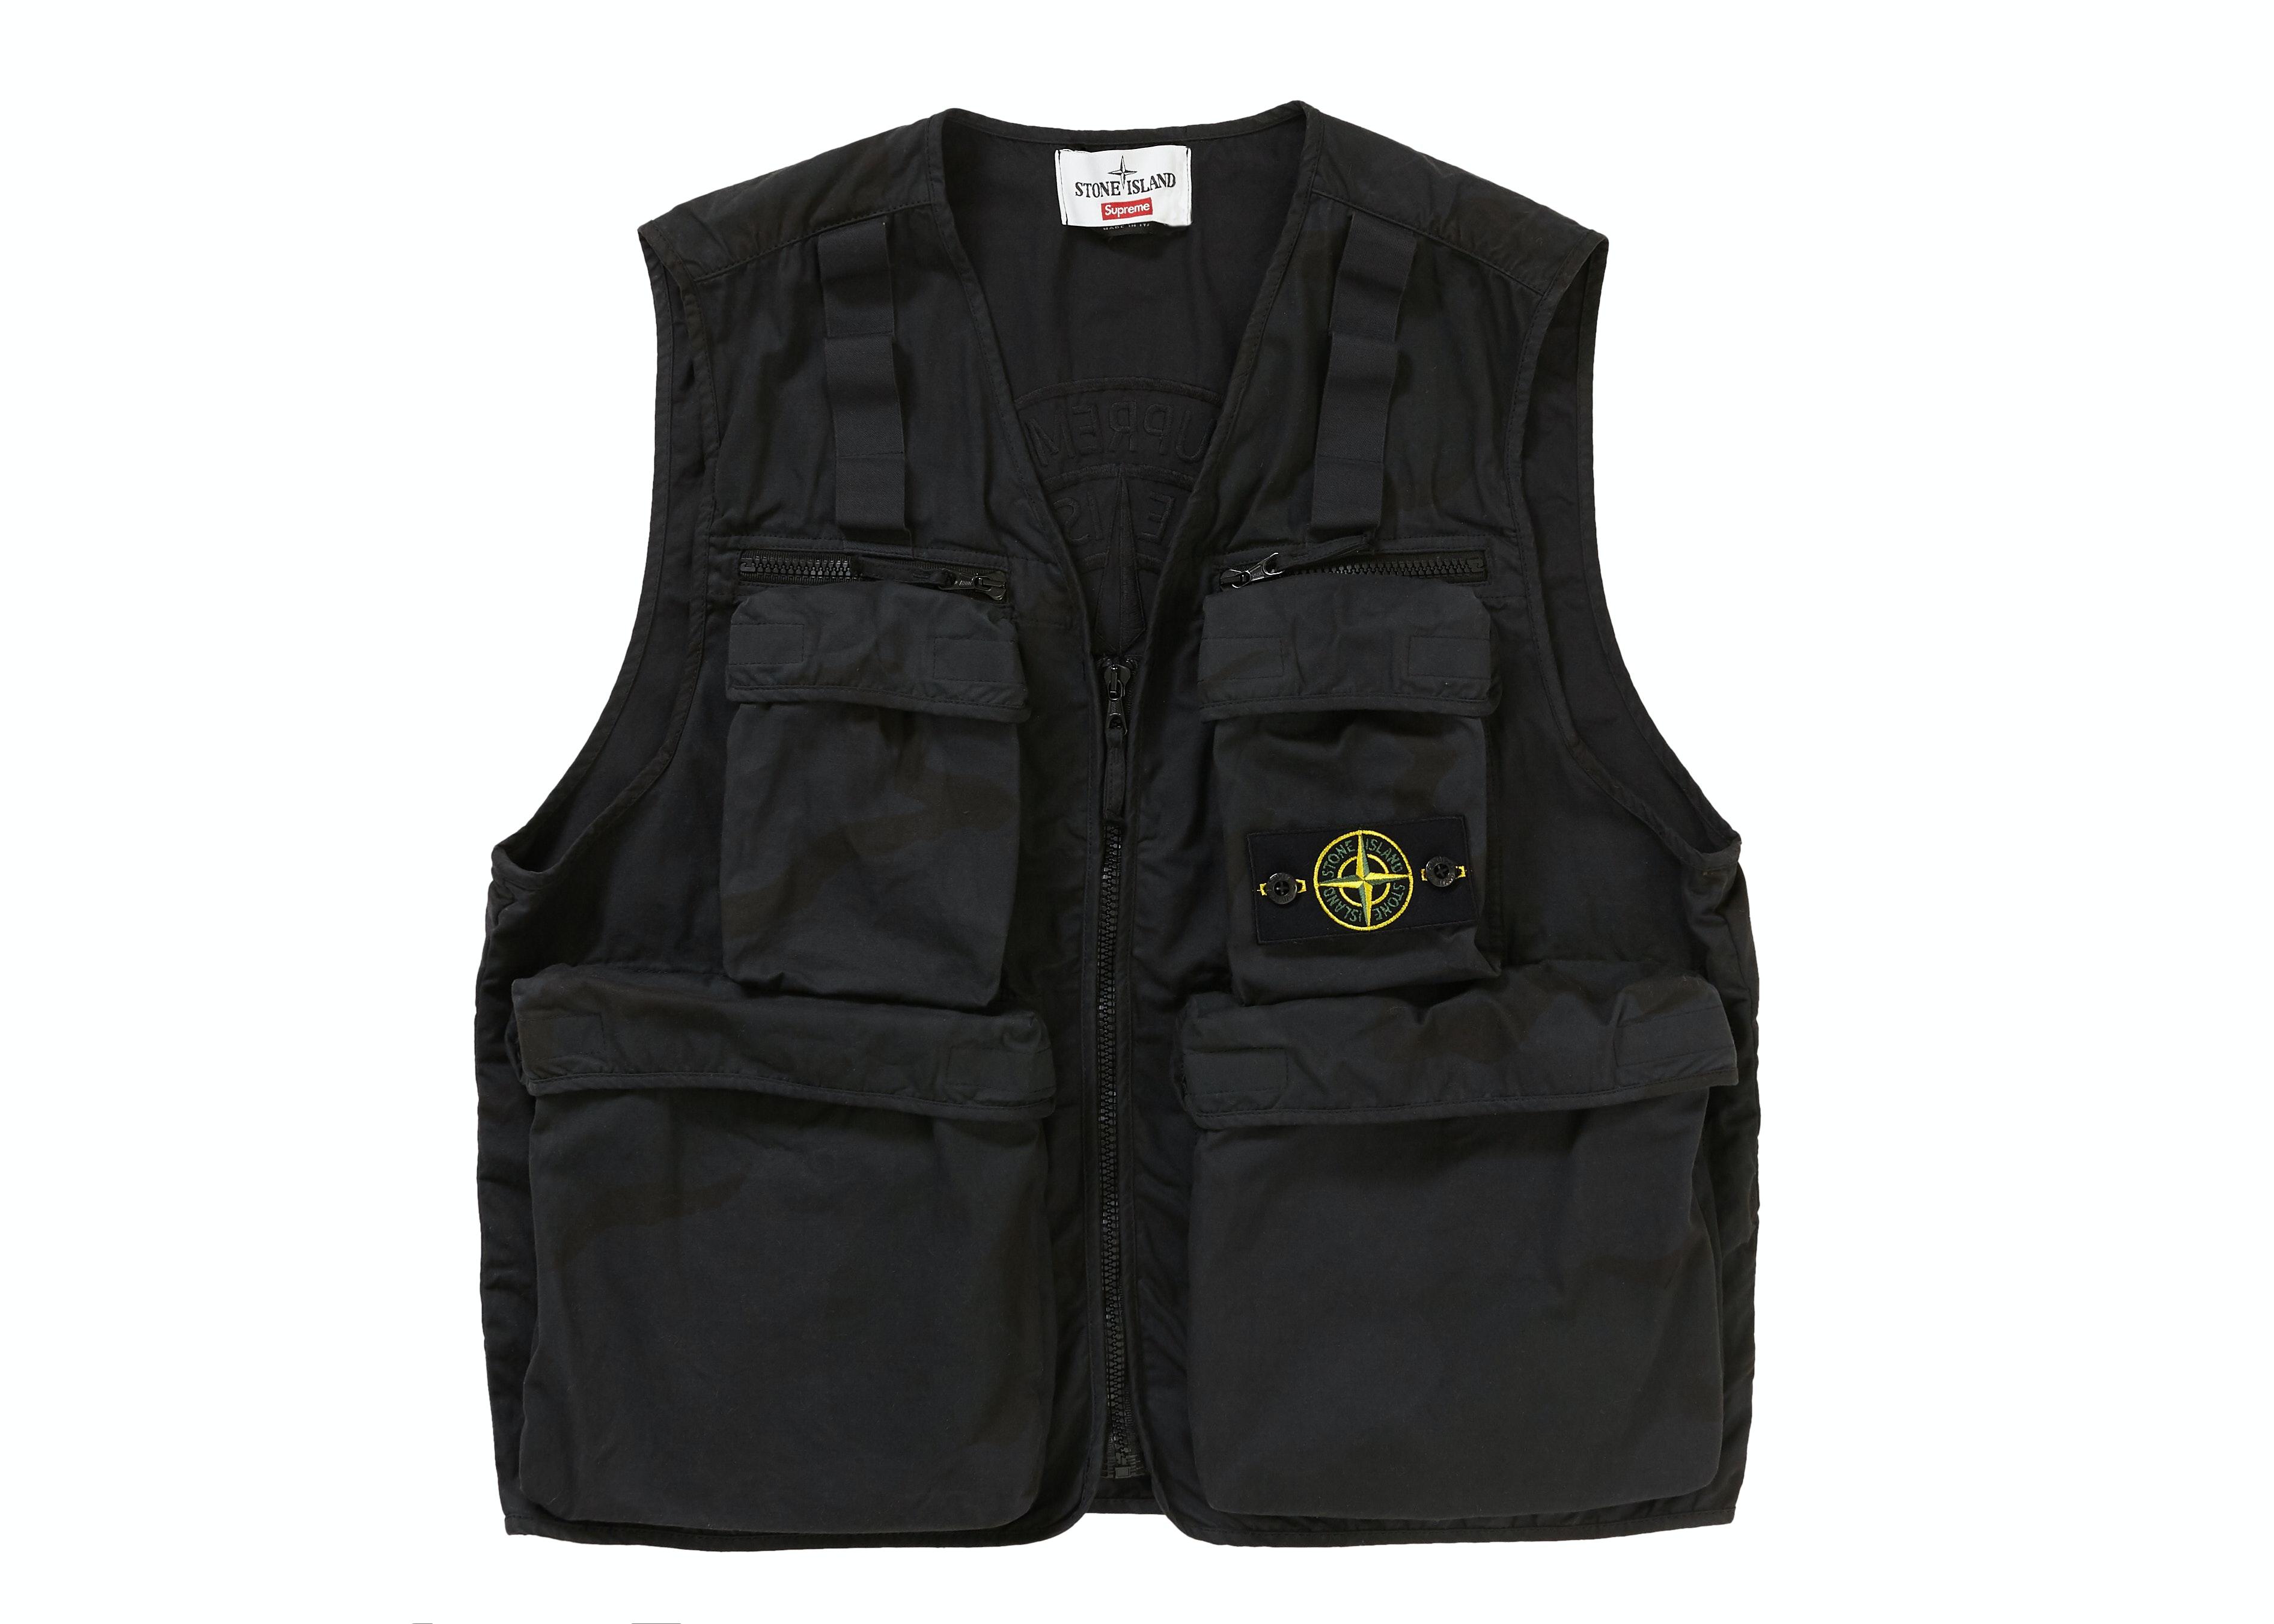 Supreme Stone Island Camo Cargo Vest Black Camo